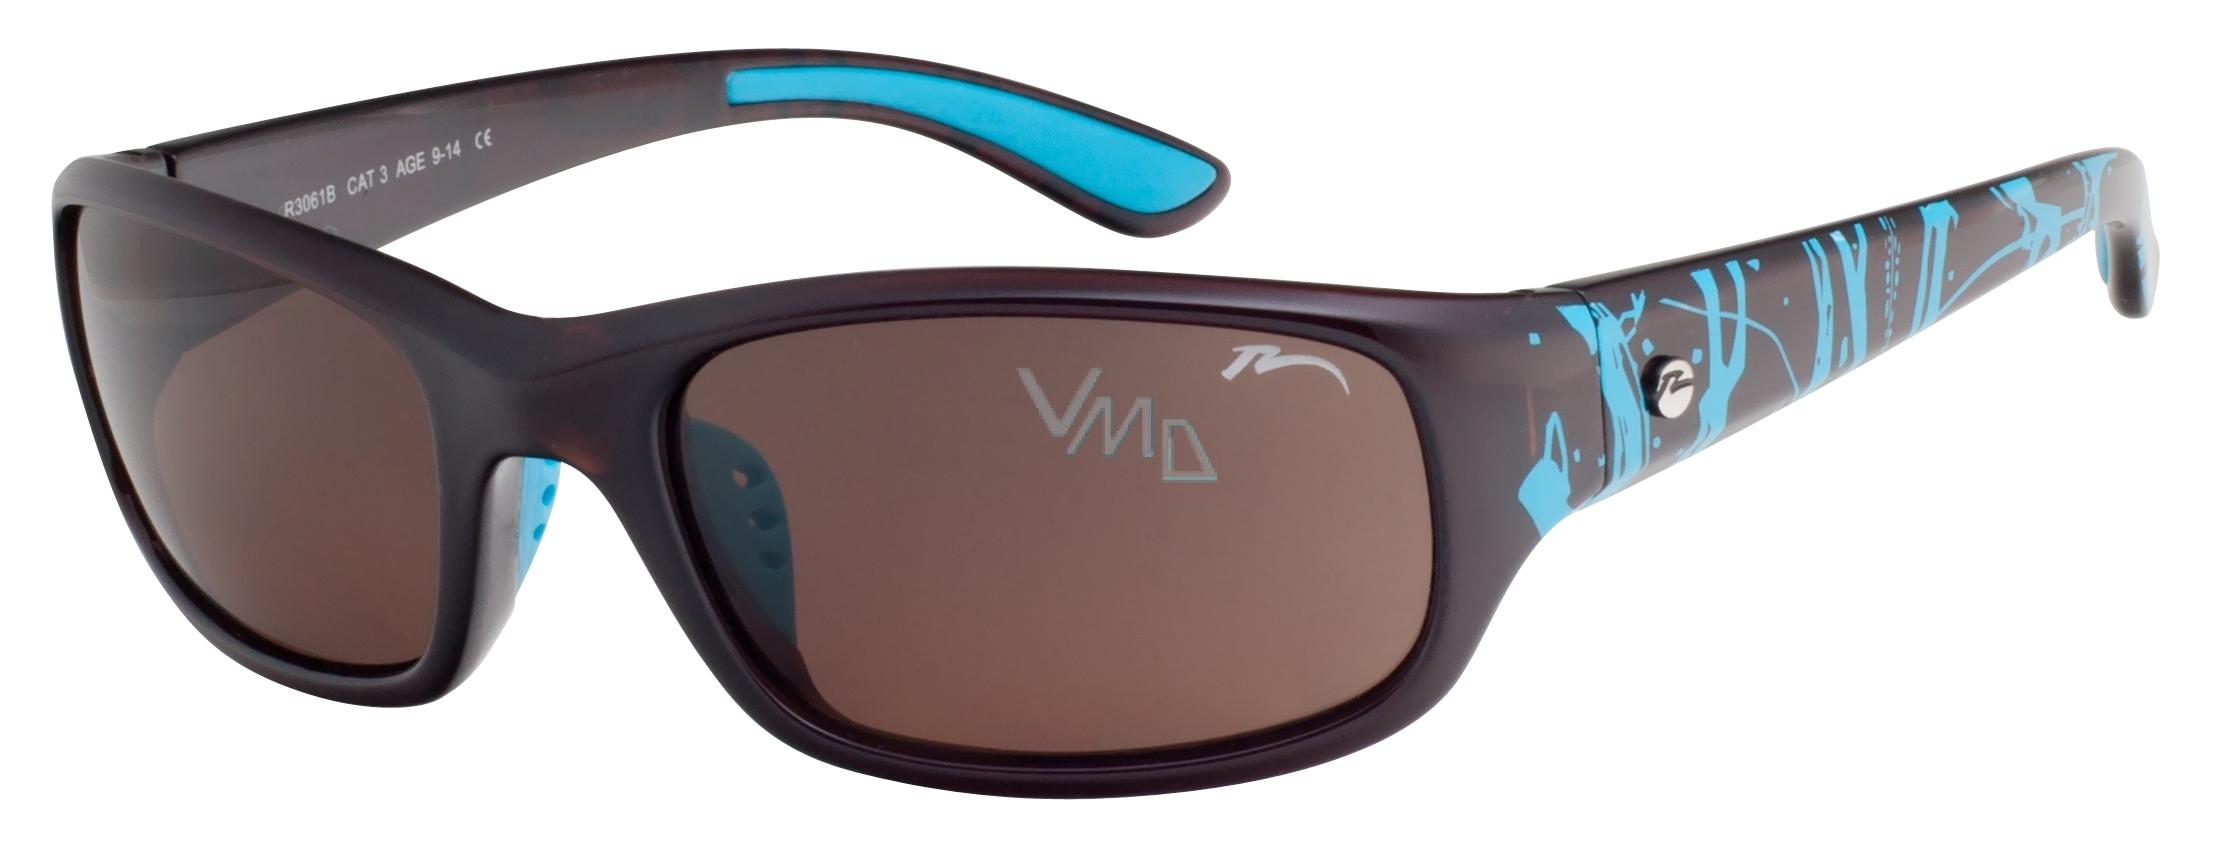 ae9b7aa93 Relax Lissa Sluneční brýle pro děti R3061B - VMD parfumerie - drogerie